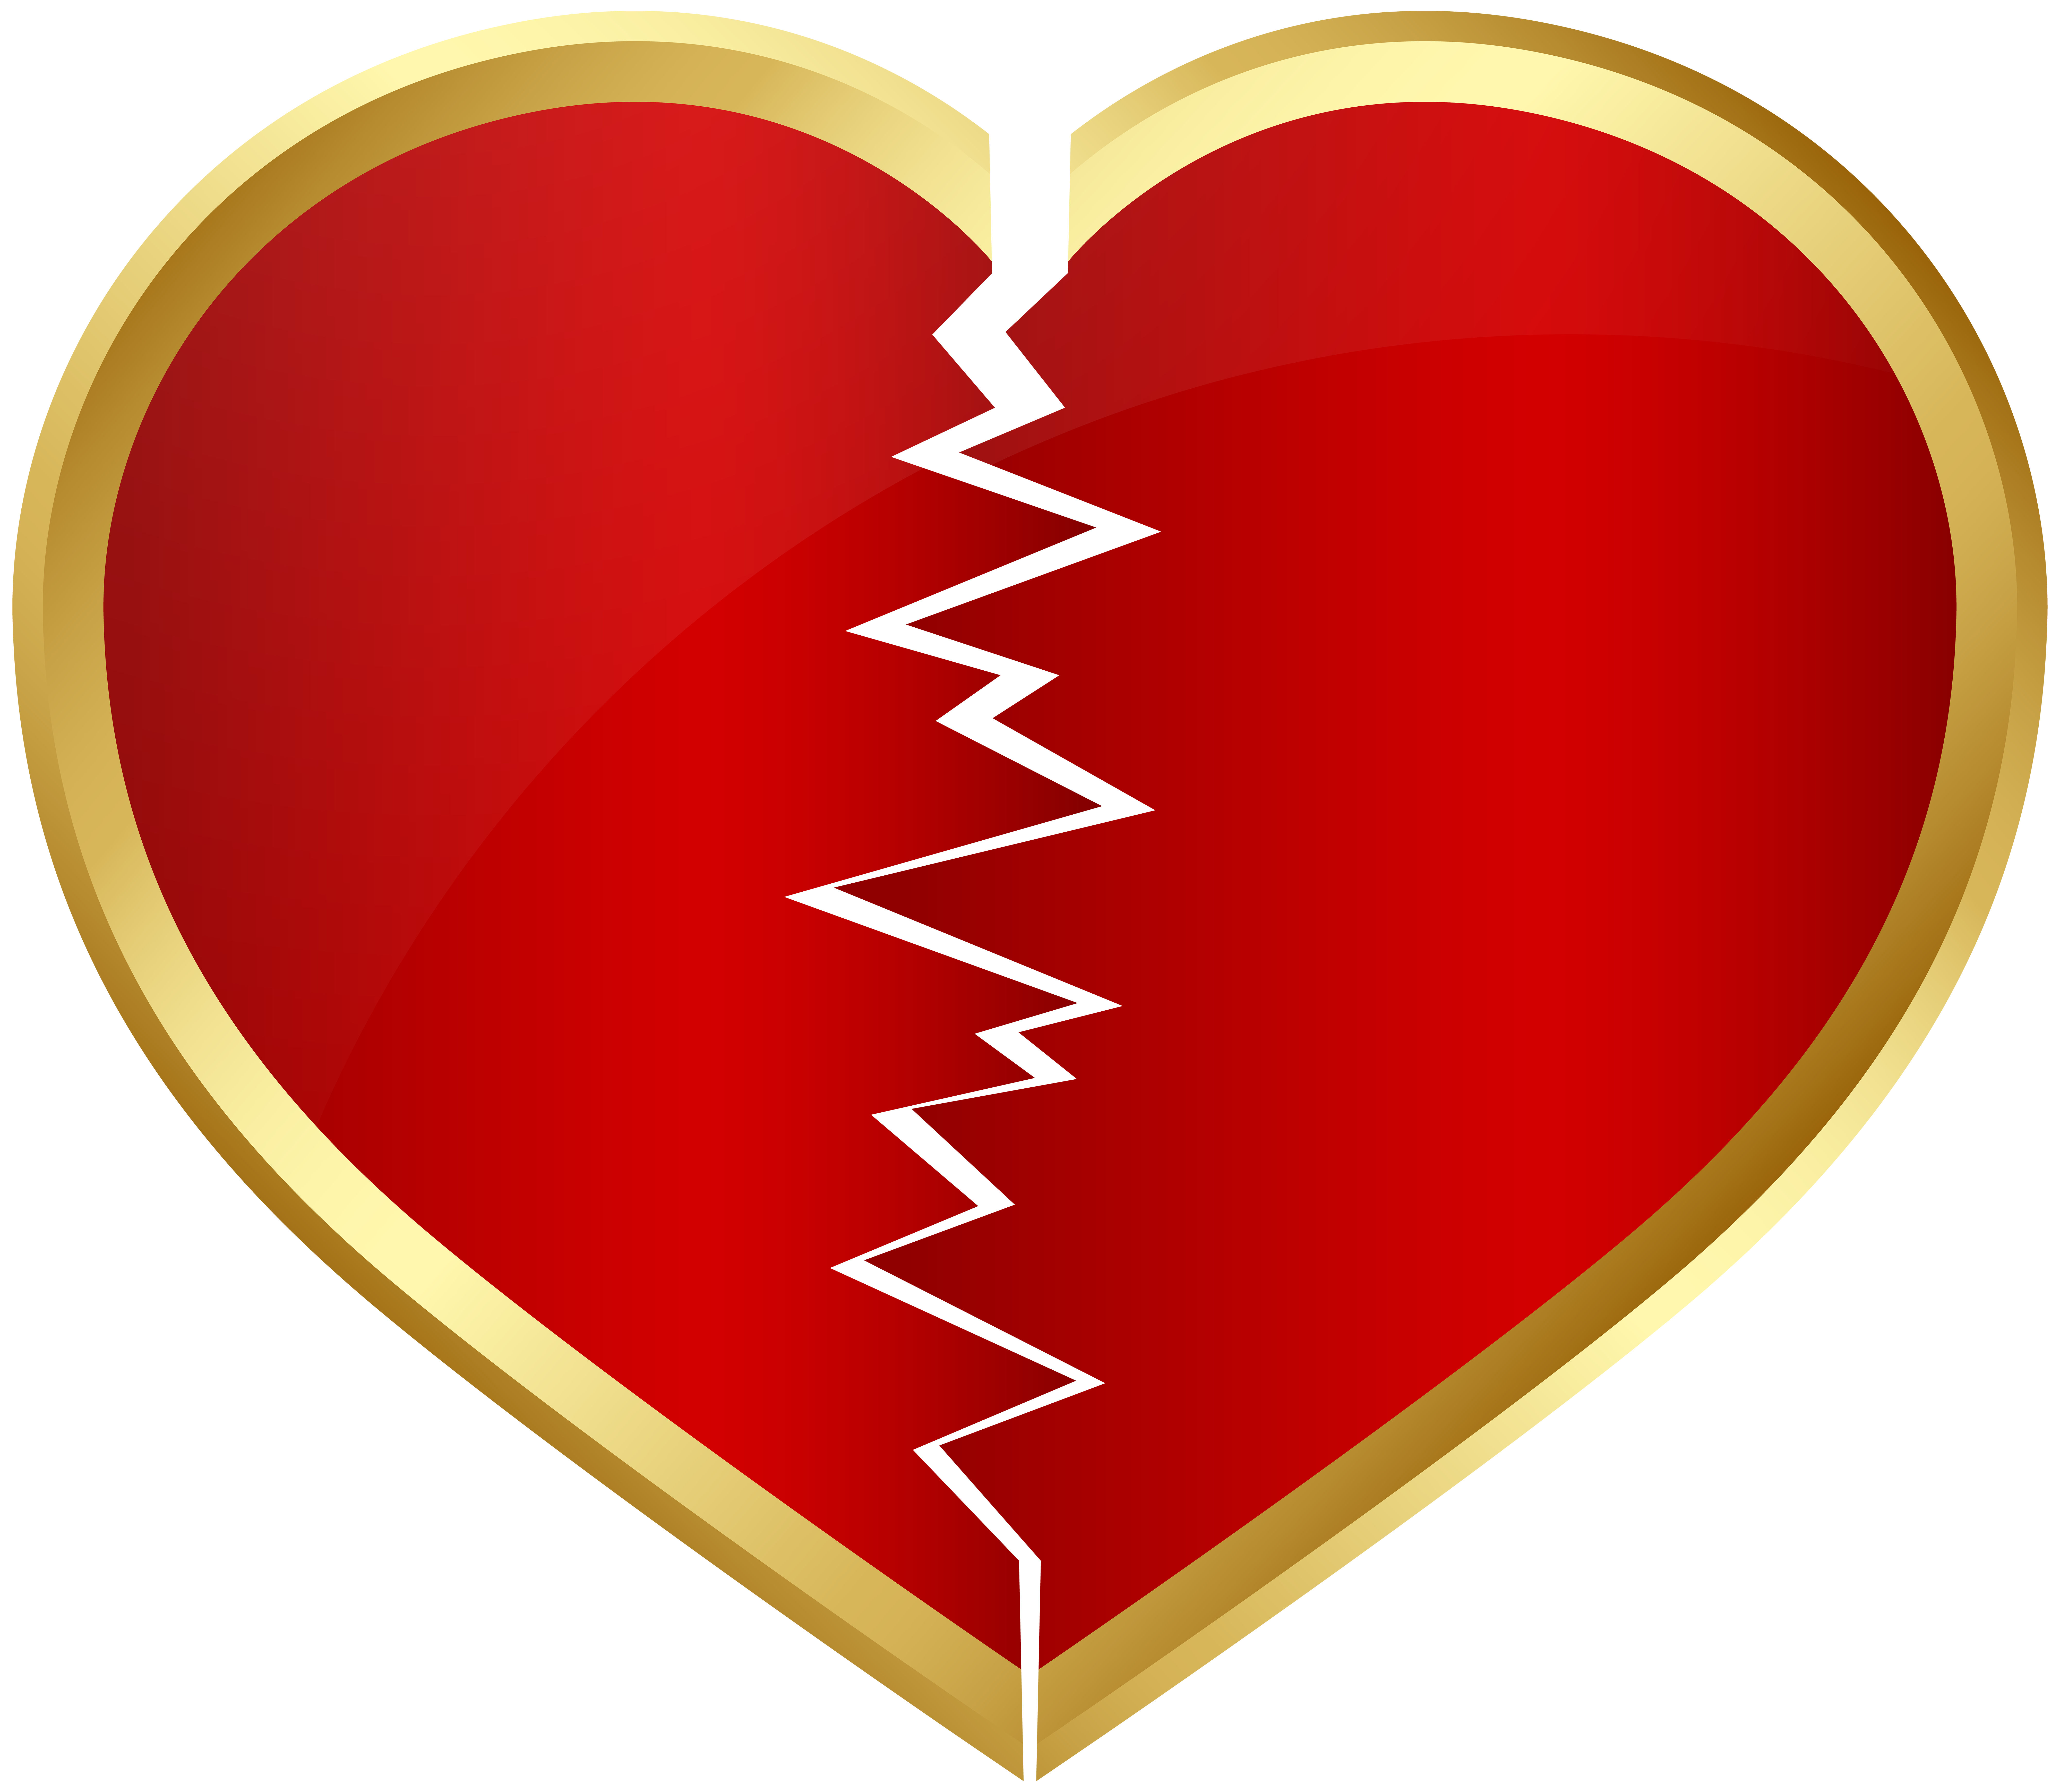 Heart broken clipart jpg library stock Broken Heart Transparent Clip Art Image | Gallery Yopriceville ... jpg library stock